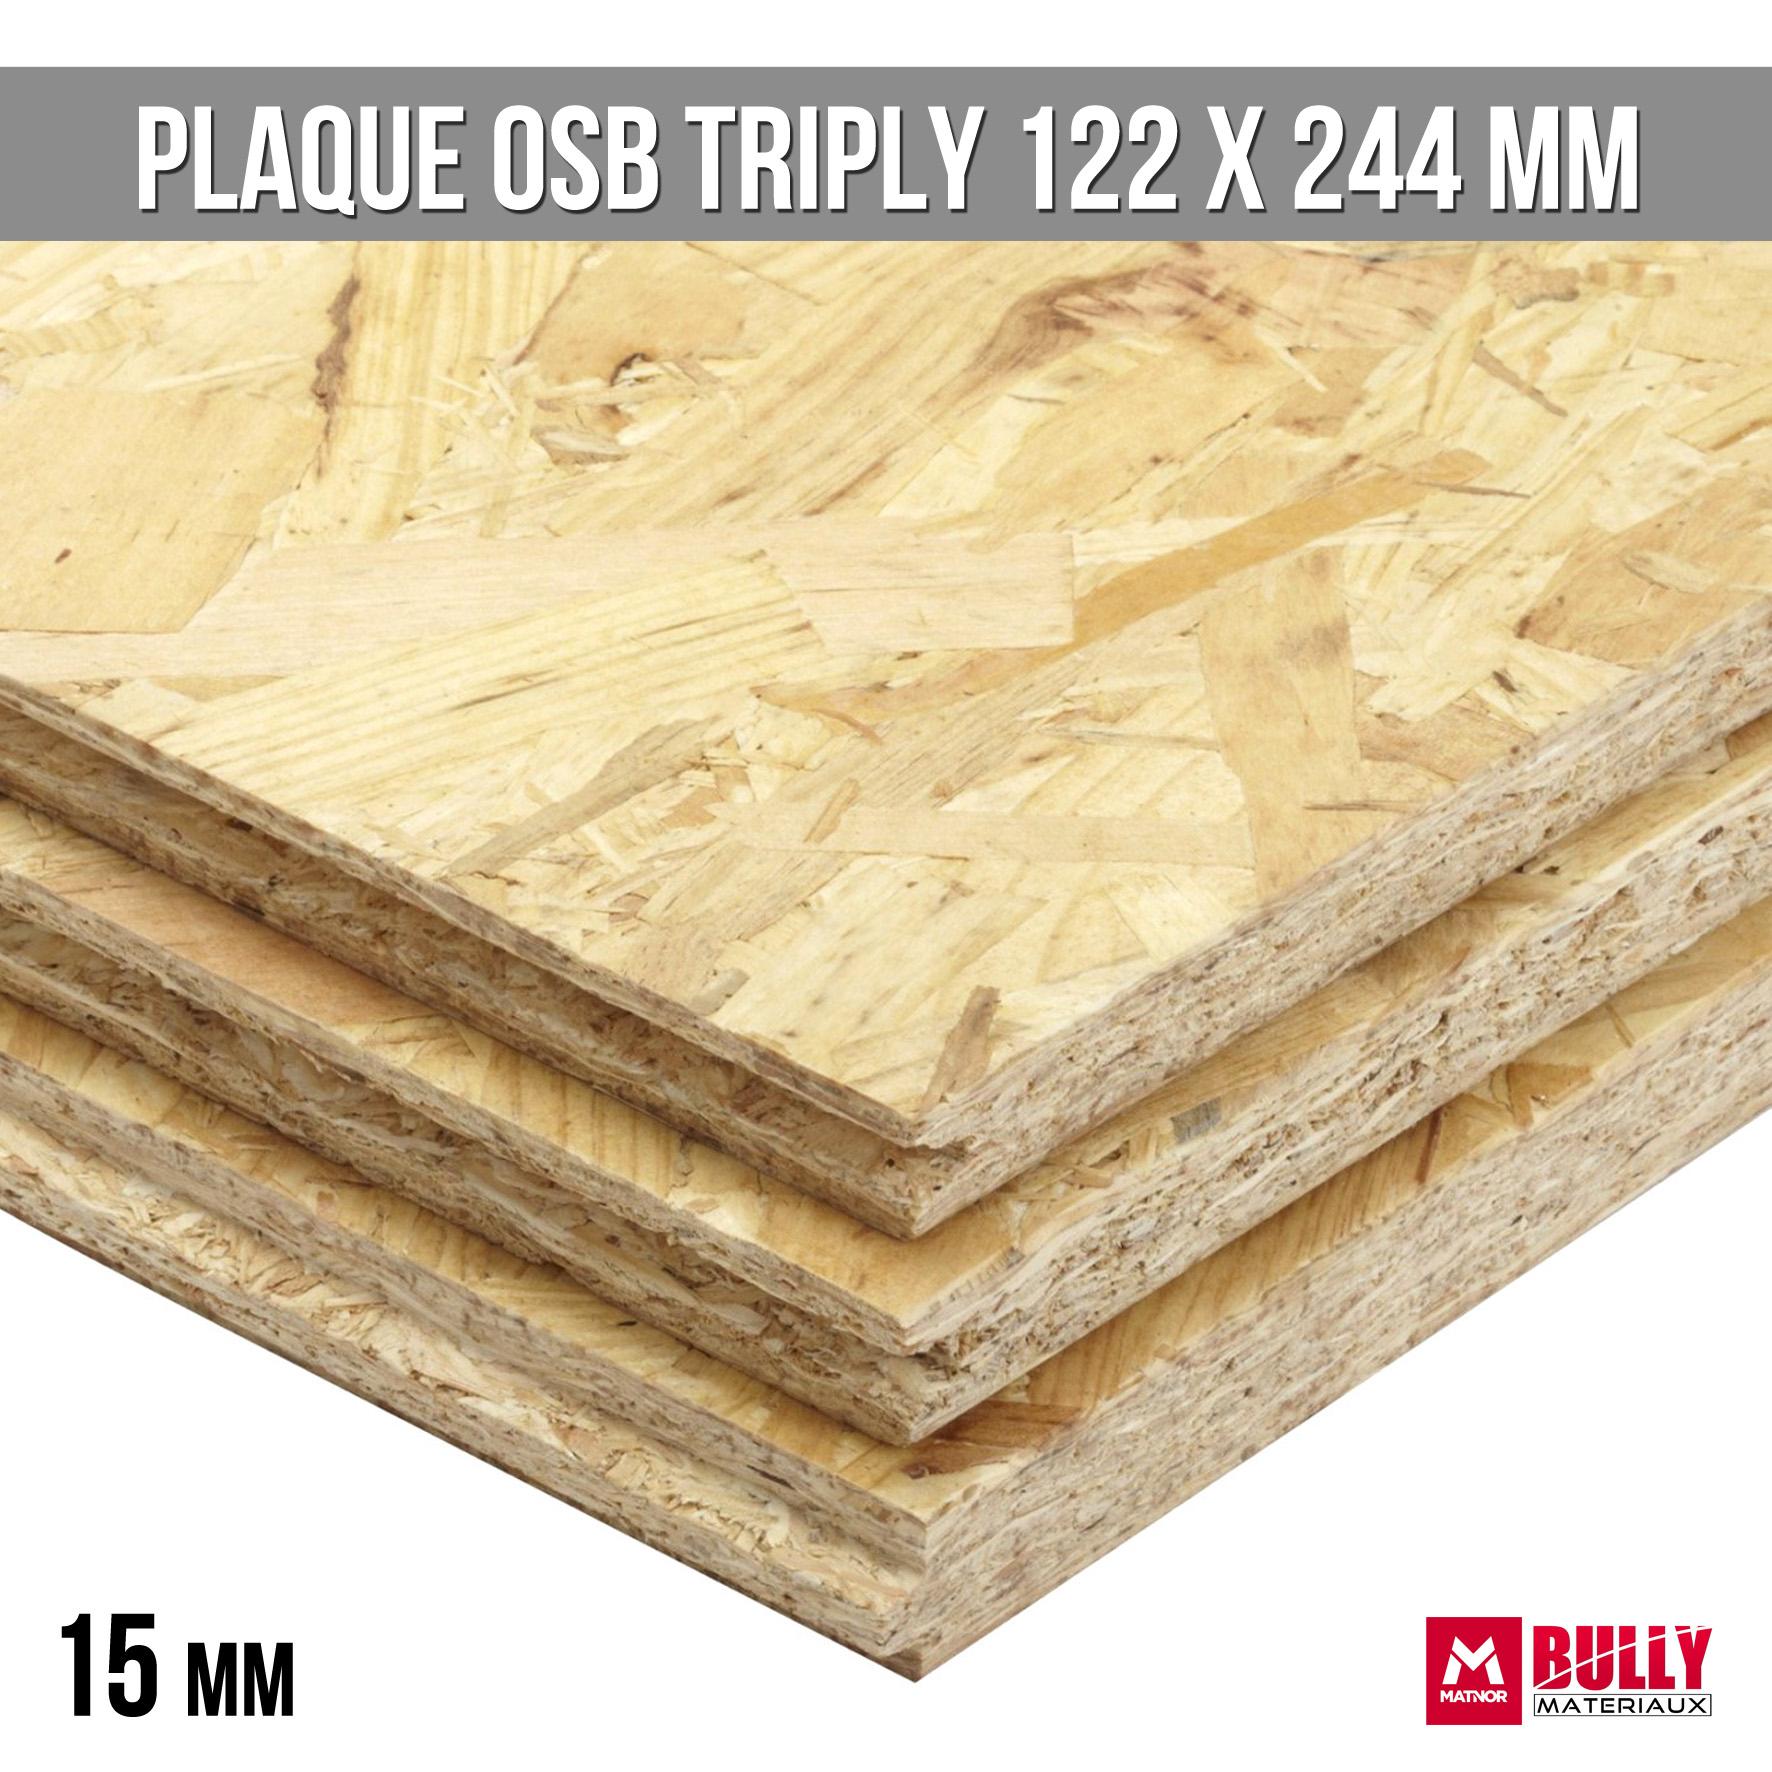 Plaque osb triply 15mm